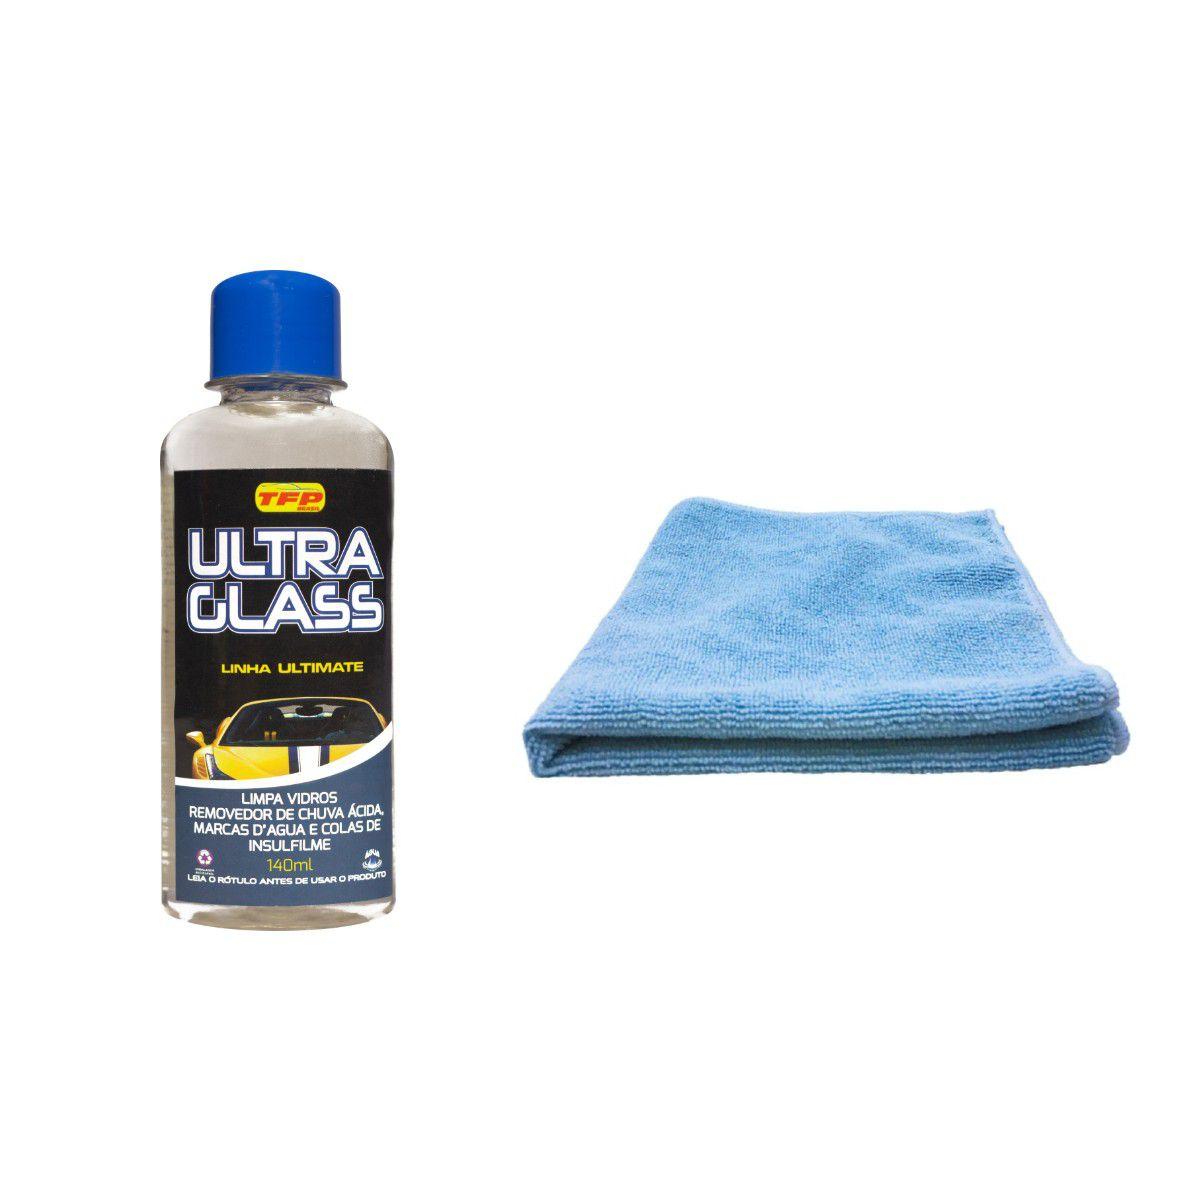 Removedor De Chuva Ácida Ultra Glass Tira Mancha Limpa Vidro  + Microfibra